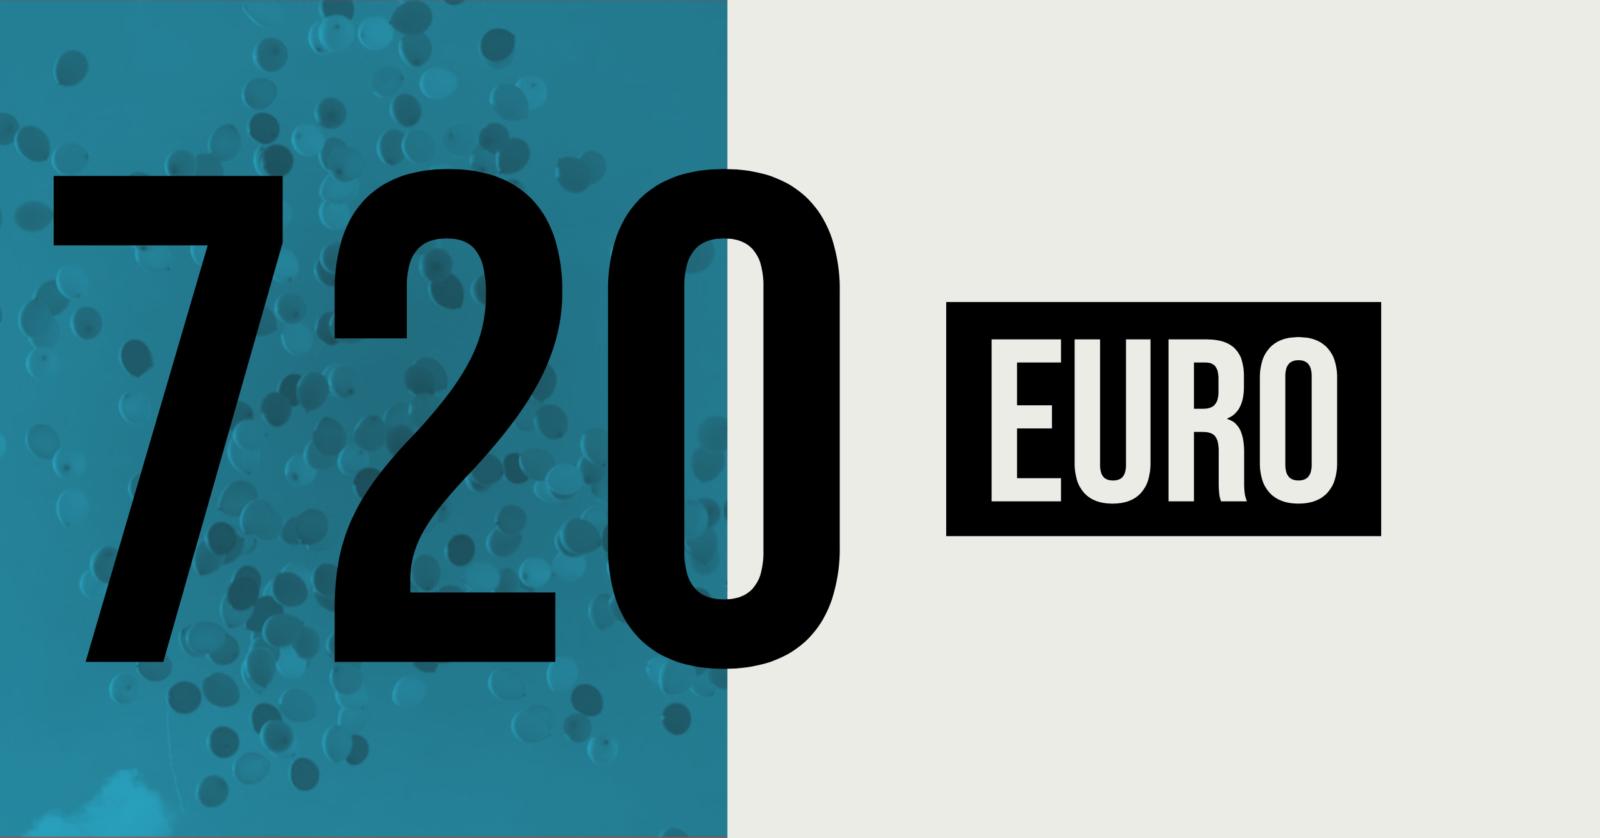 720 EURO - Bild zeigt den Betrag unserer Kalenderausgabe